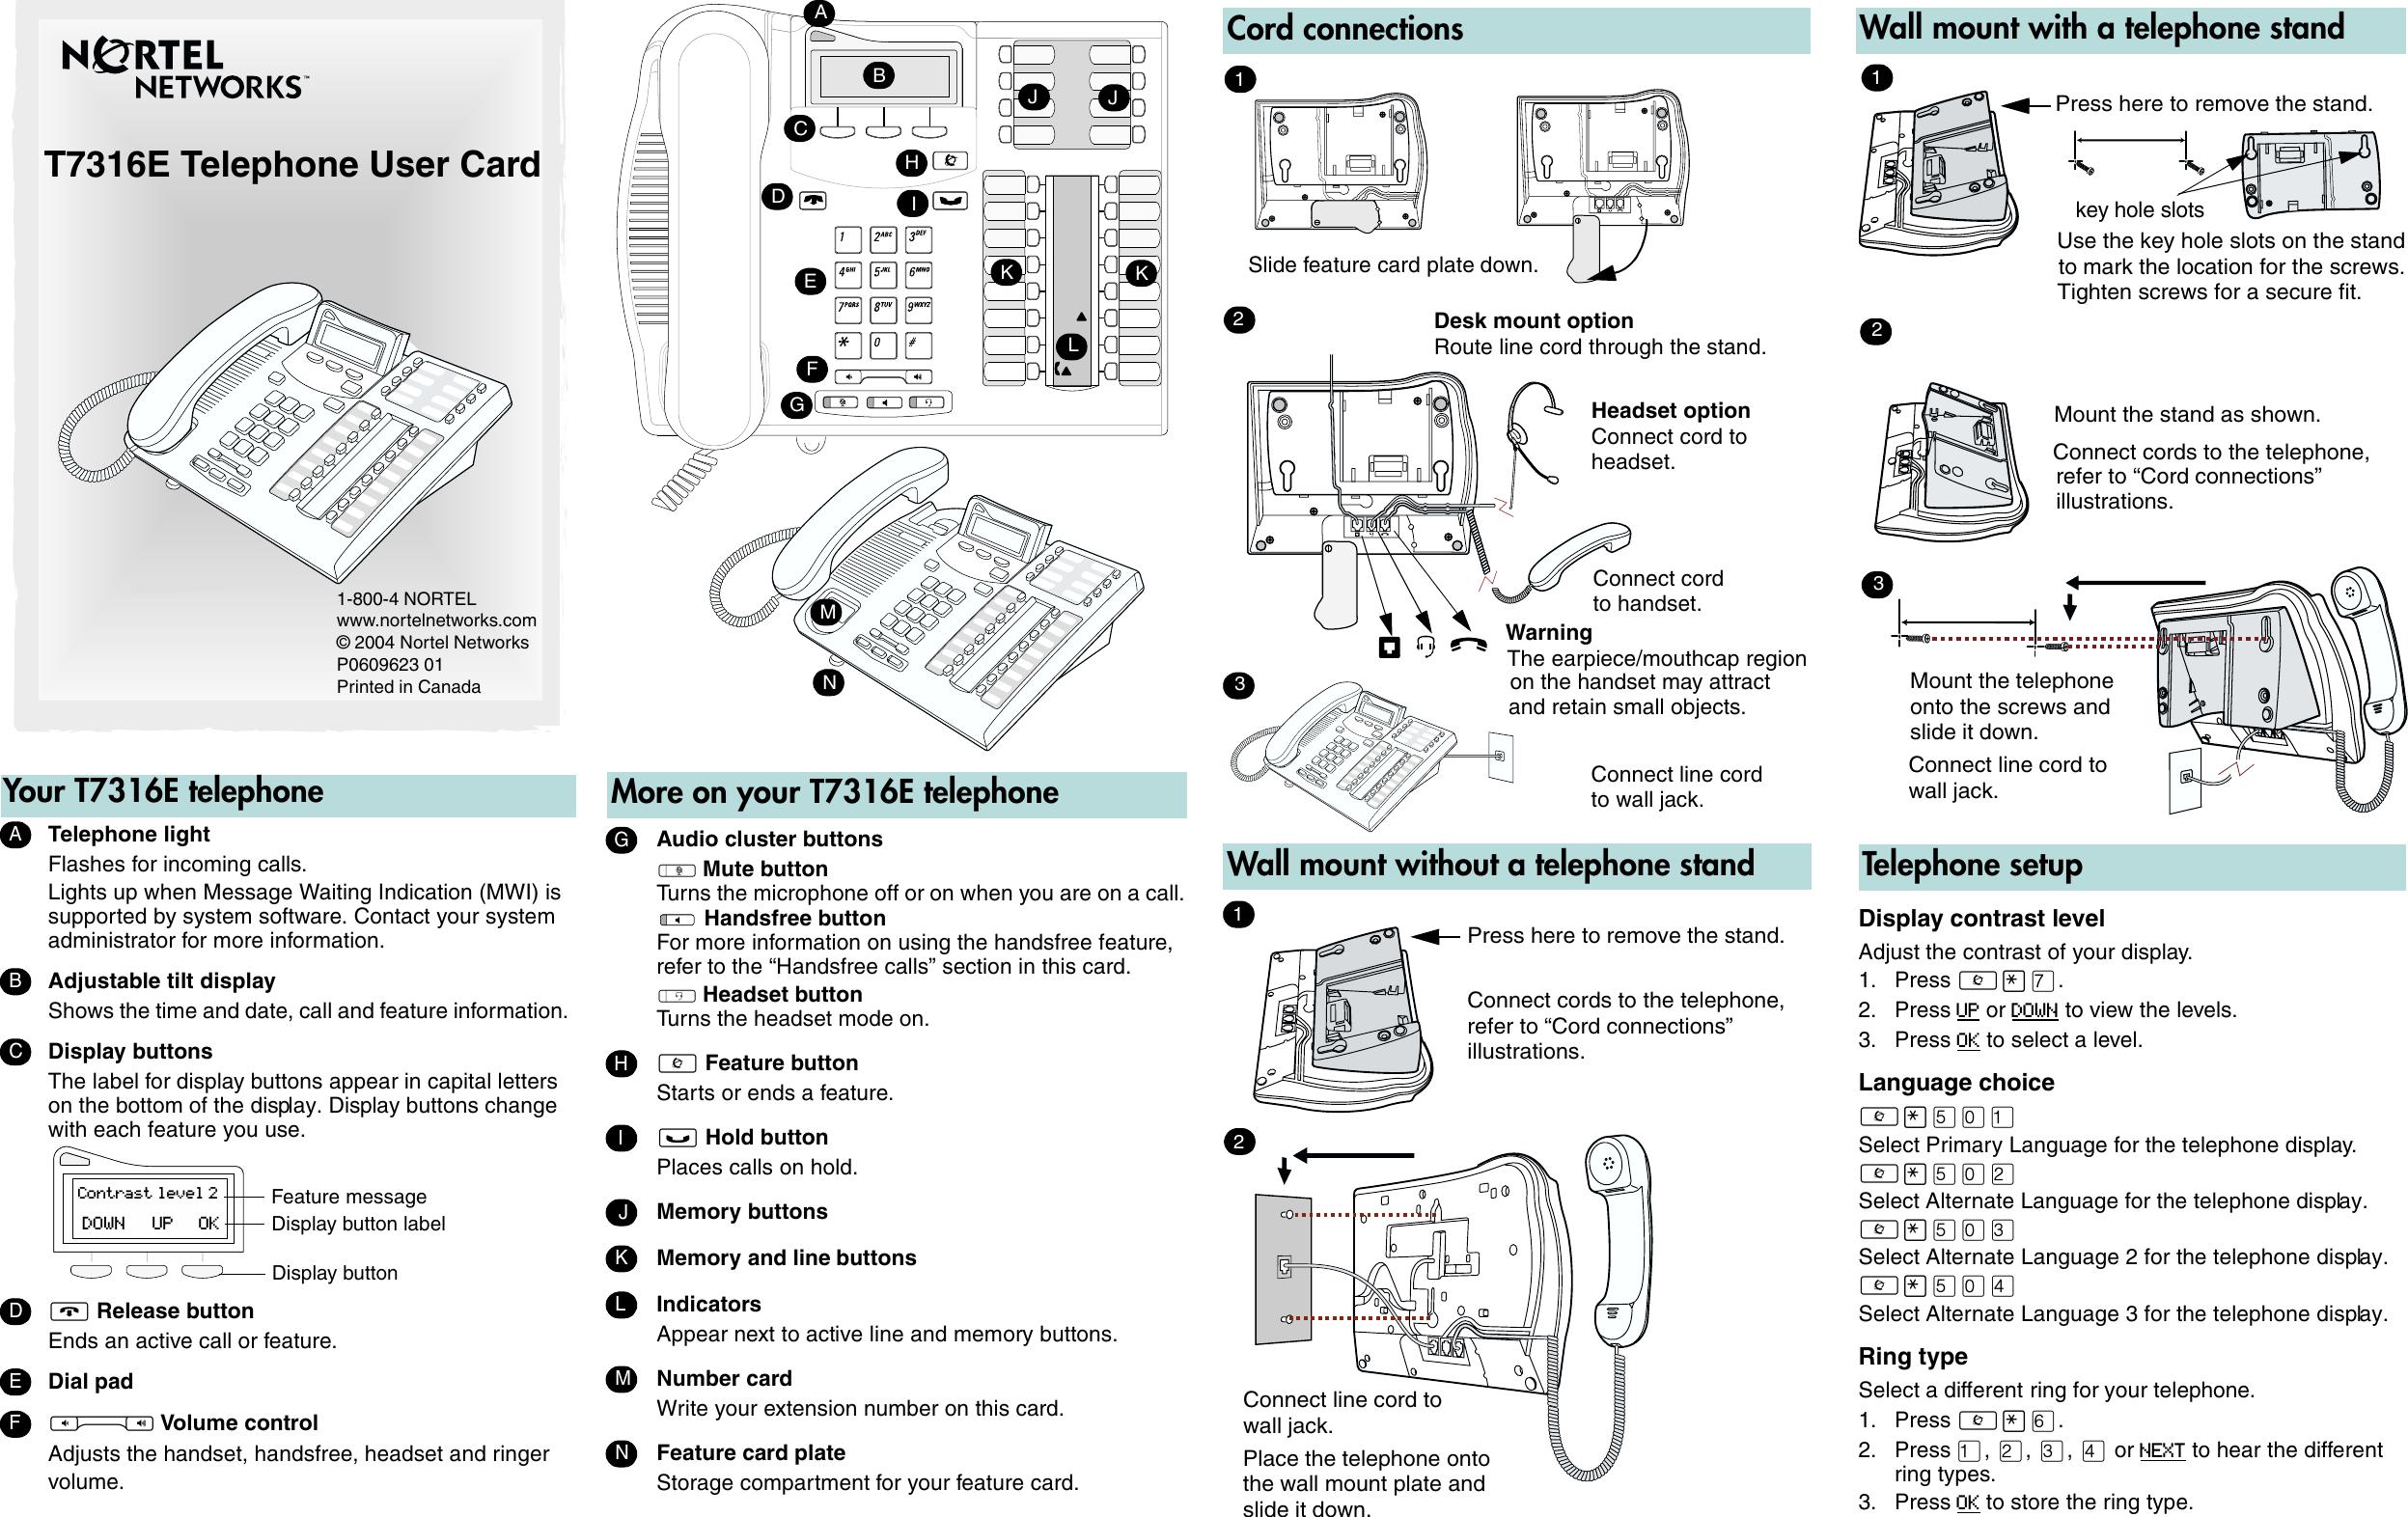 Avaya T7316E Telephone Users Manual User Card